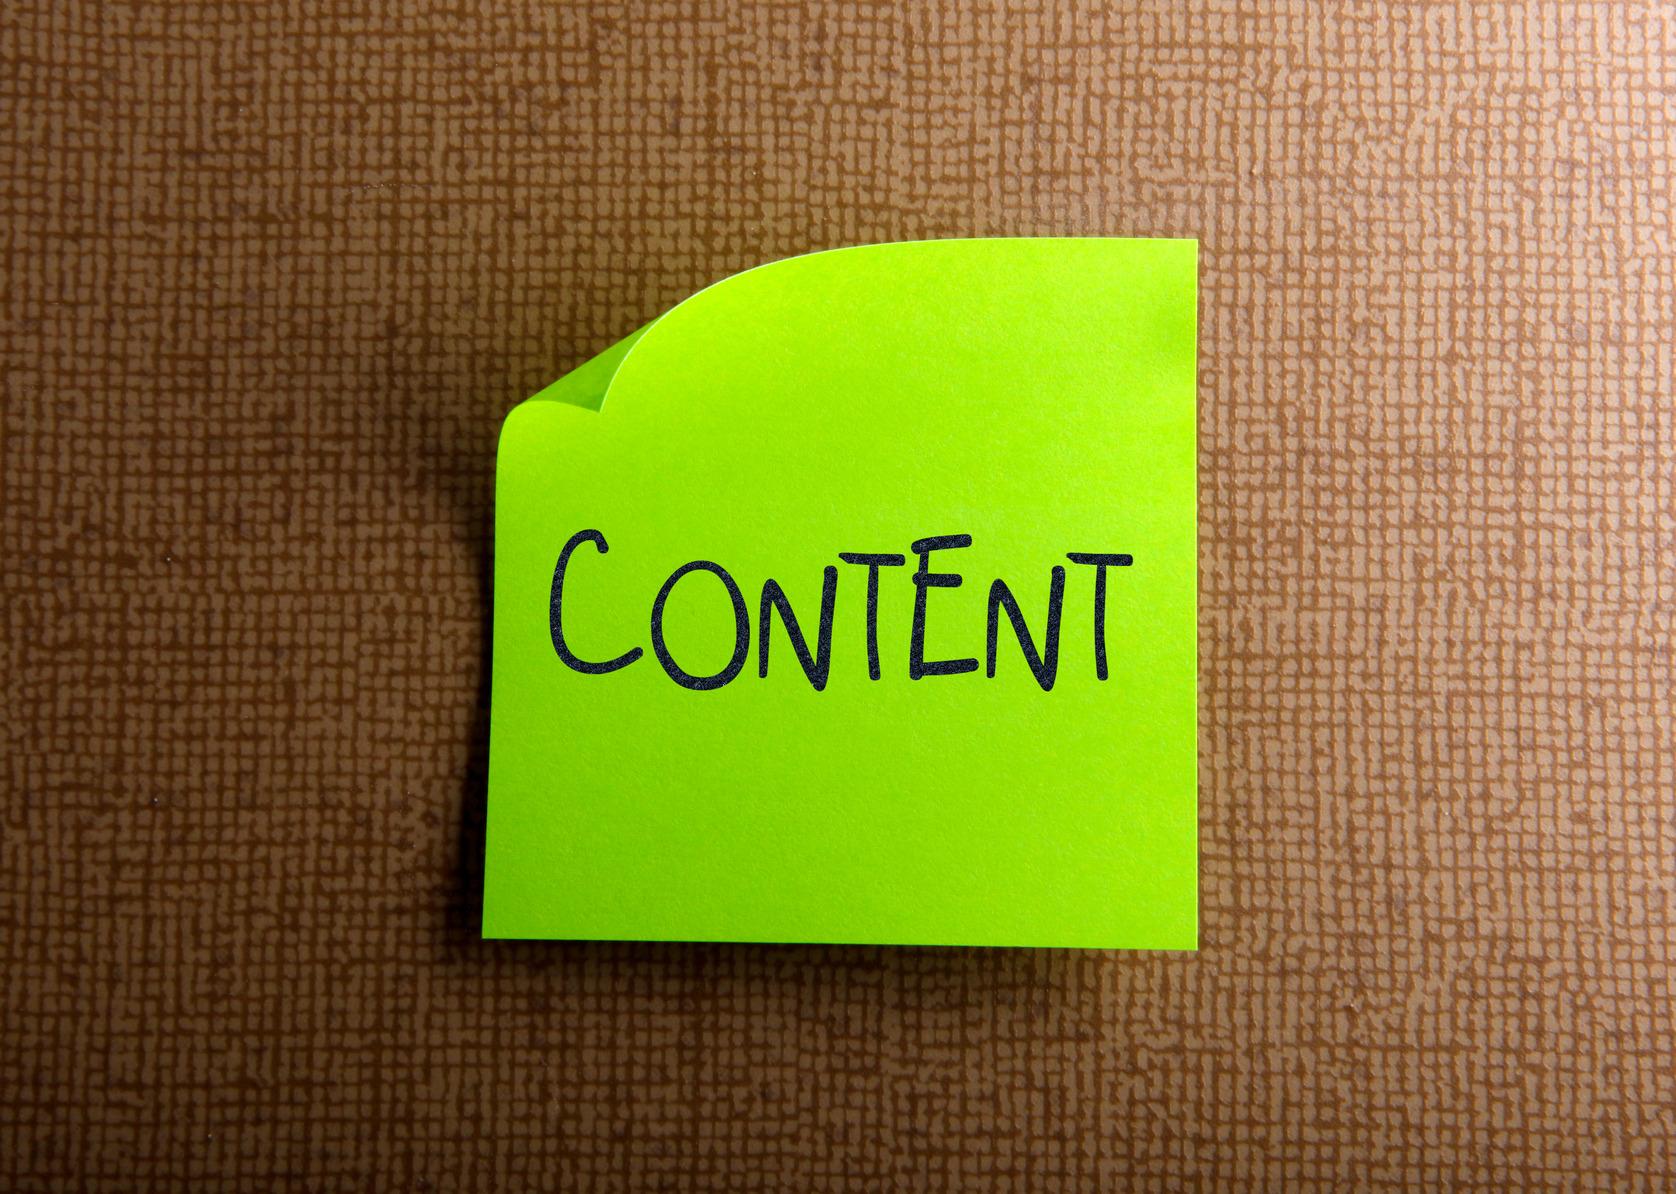 Content Posit